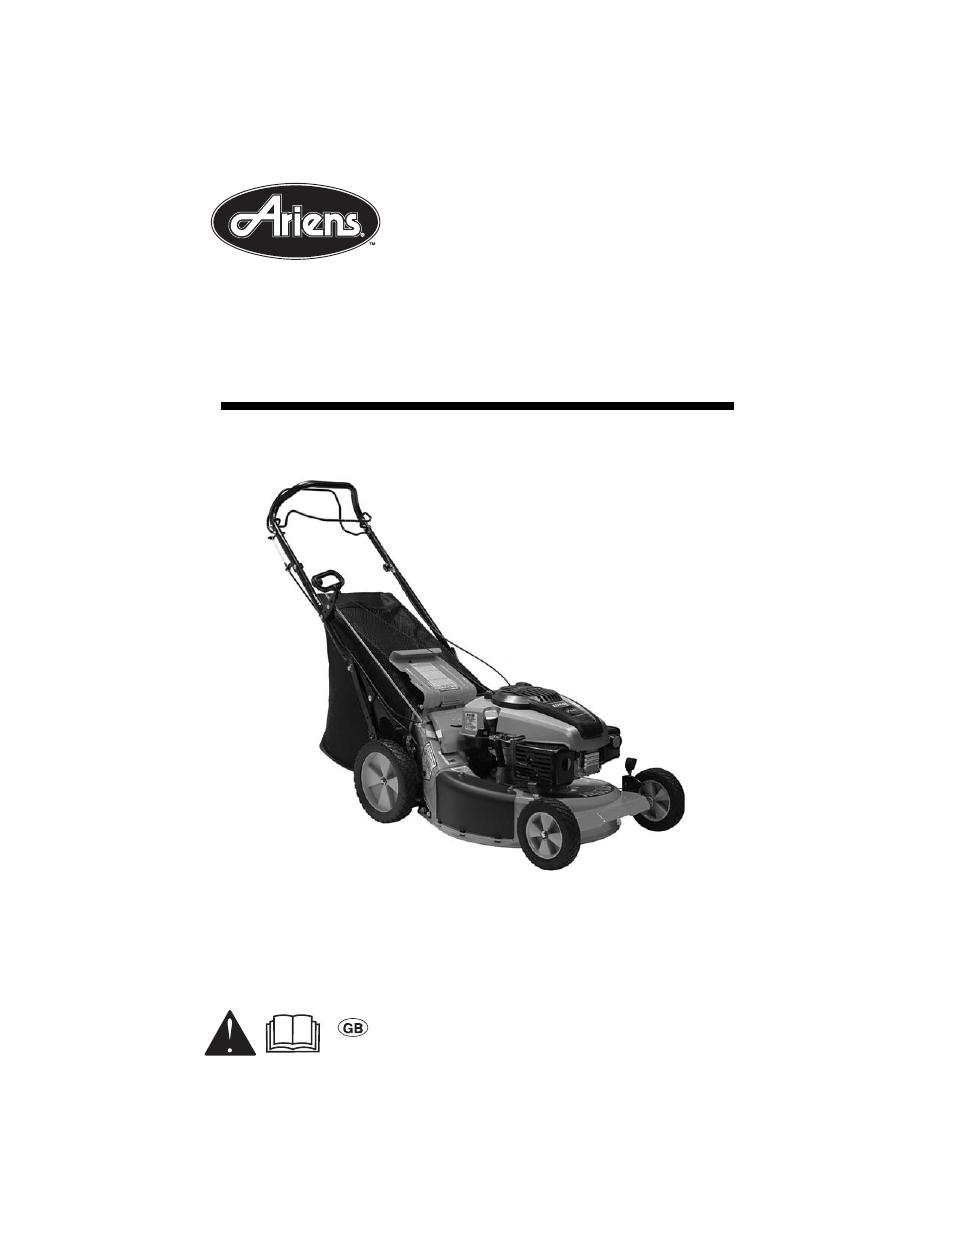 Ariens lm21sw manual